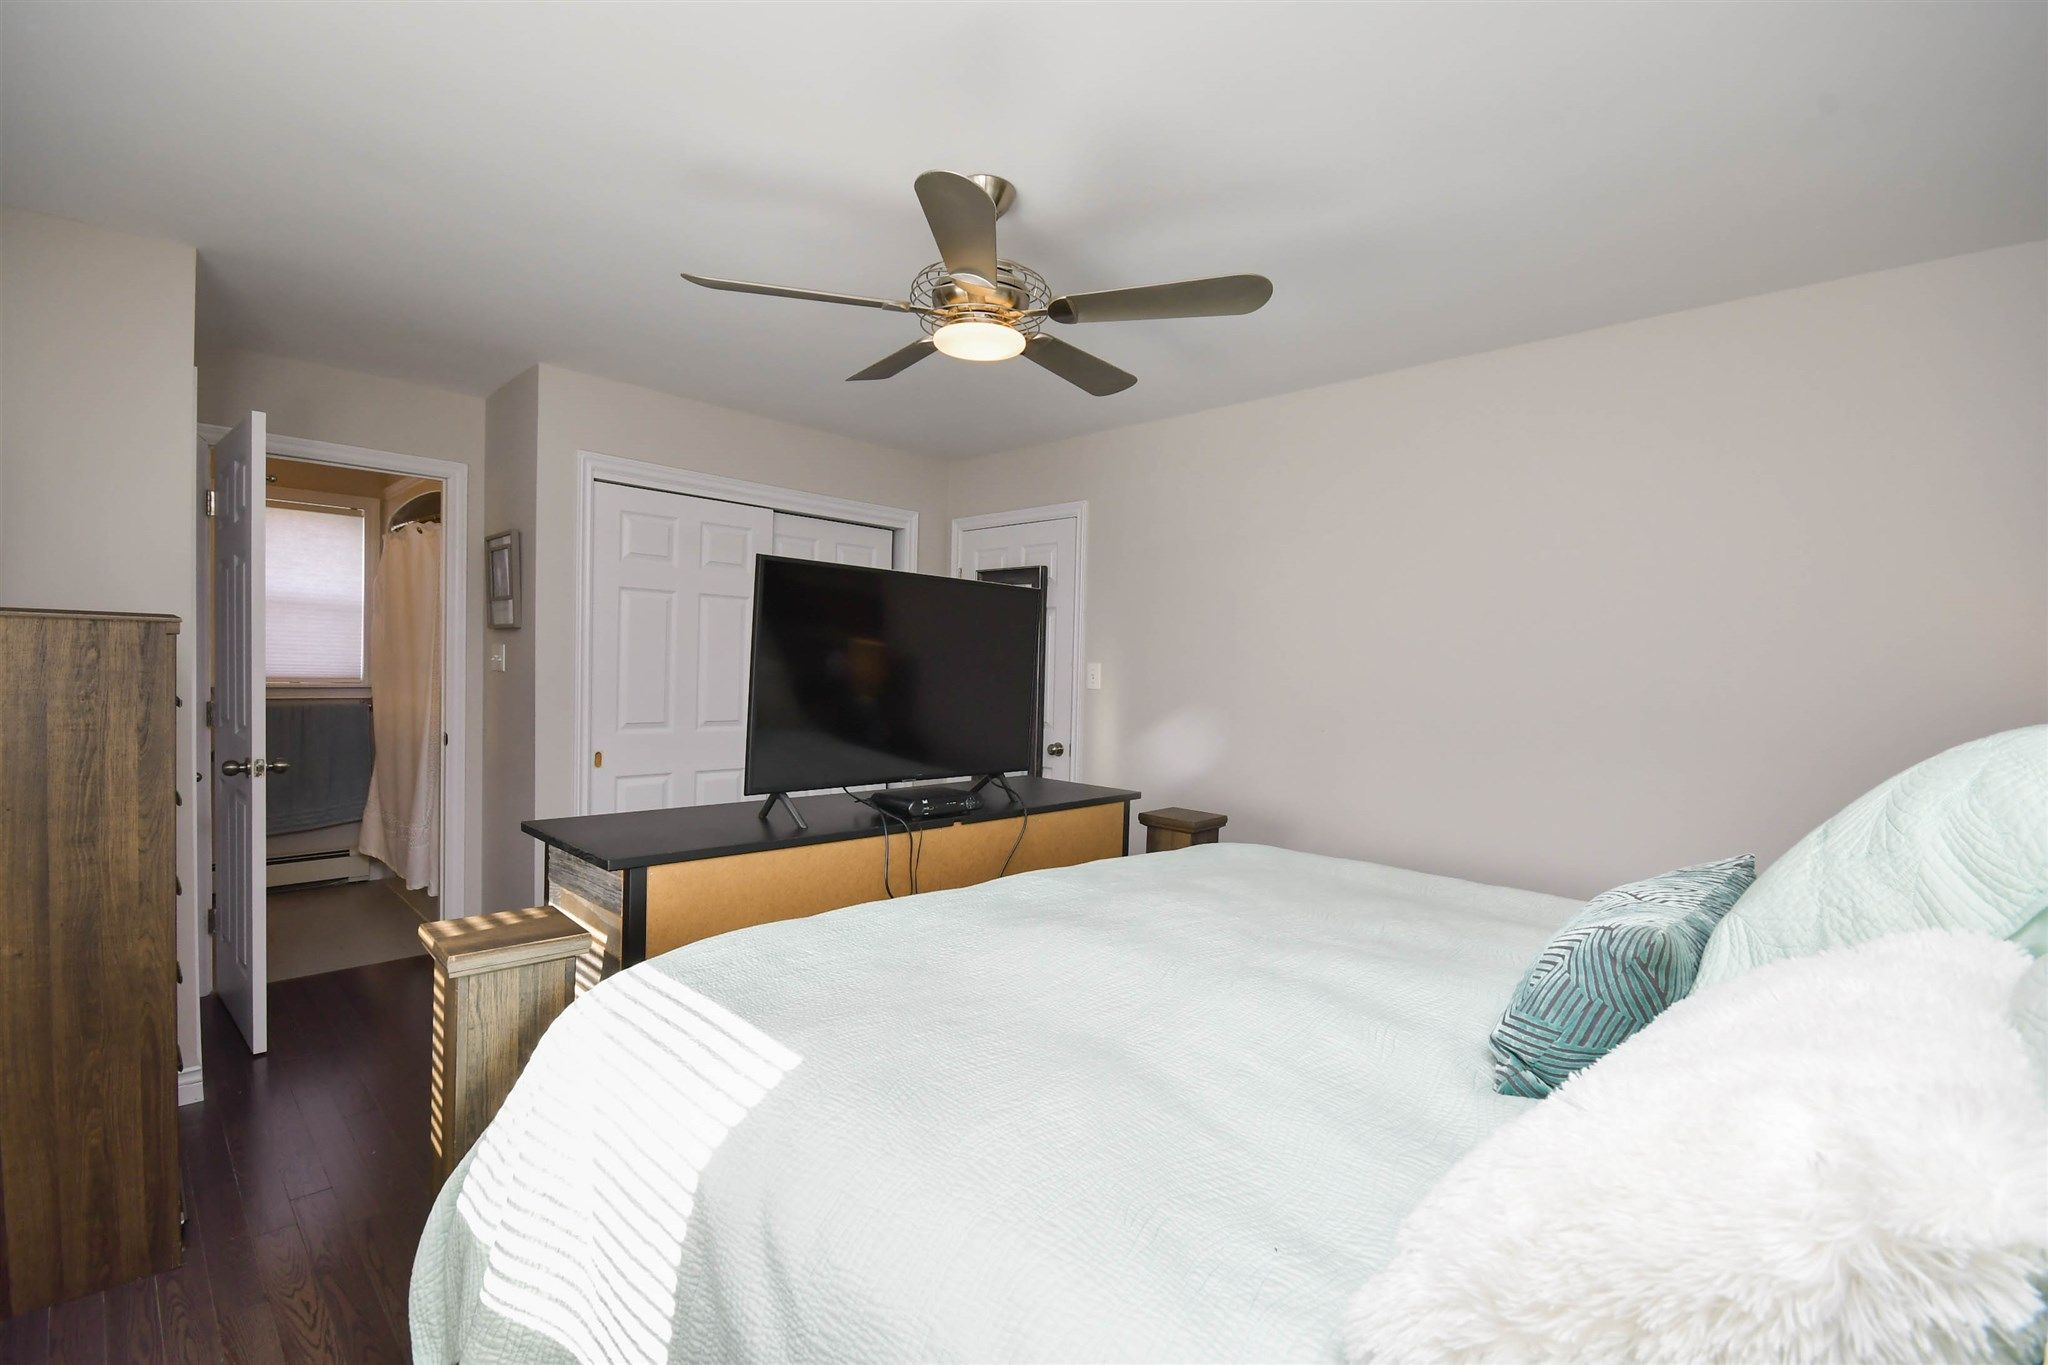 Photo 11: Photos: 17 Armstrong Court in Halifax: 5-Fairmount, Clayton Park, Rockingham Residential for sale (Halifax-Dartmouth)  : MLS®# 202105075